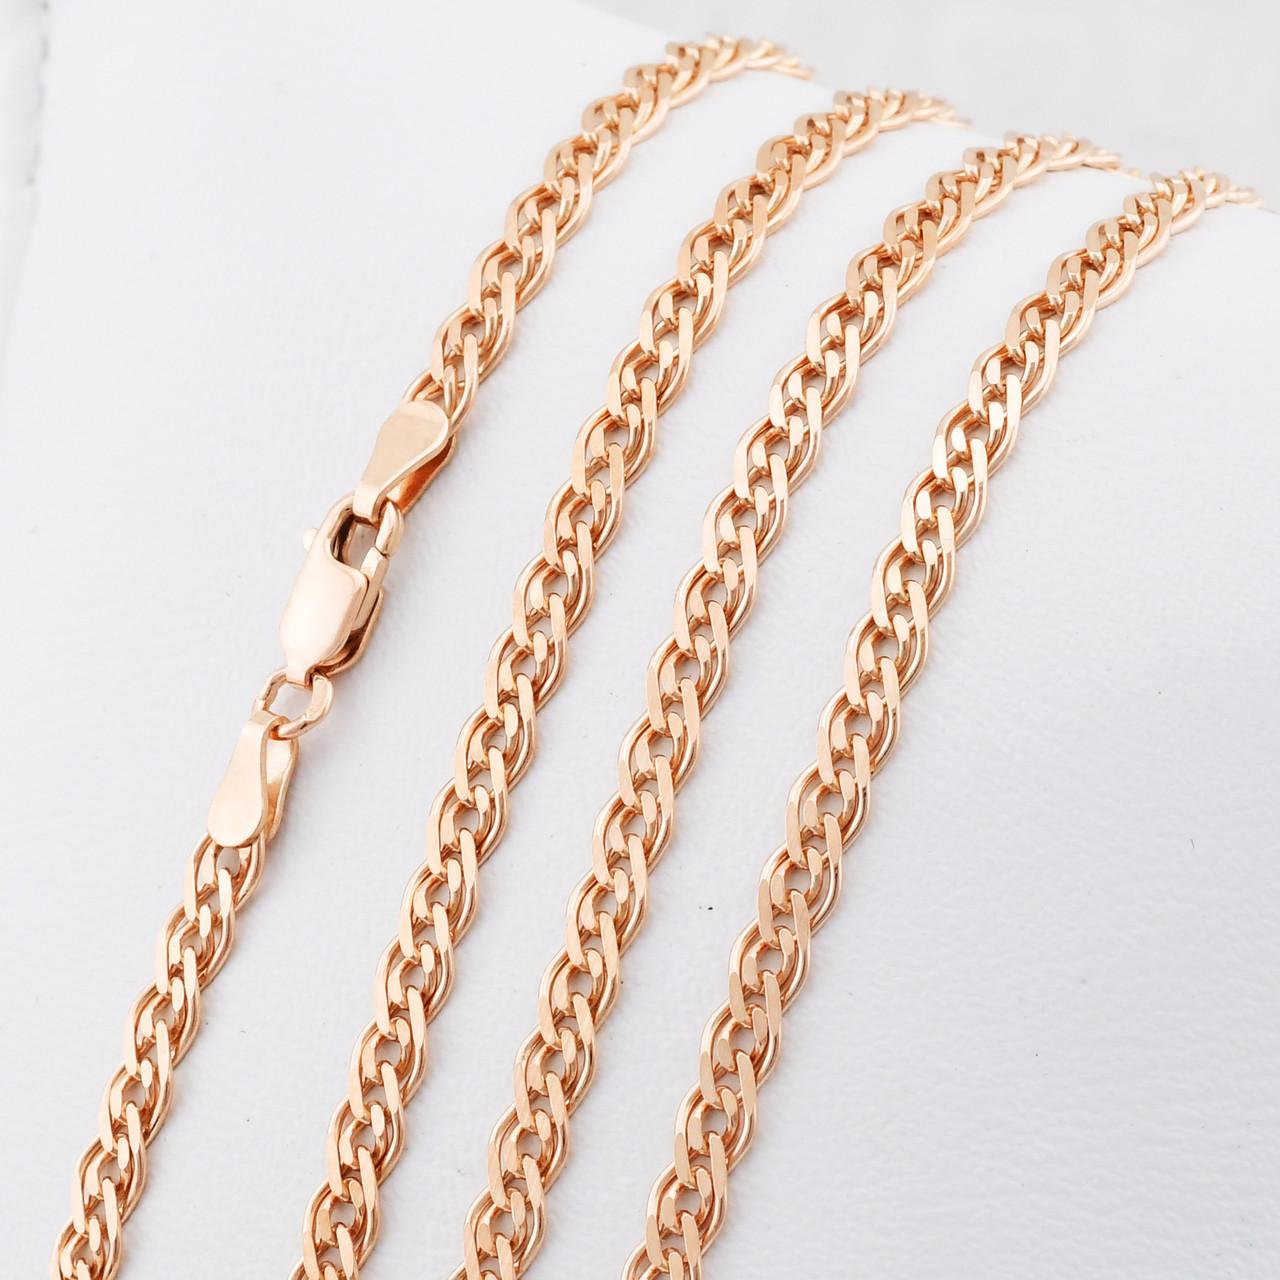 "Серебряная цепочка позолоченная ""Нонна"", ширина 3.5 мм, вес 9.04 г, длина 50 см"